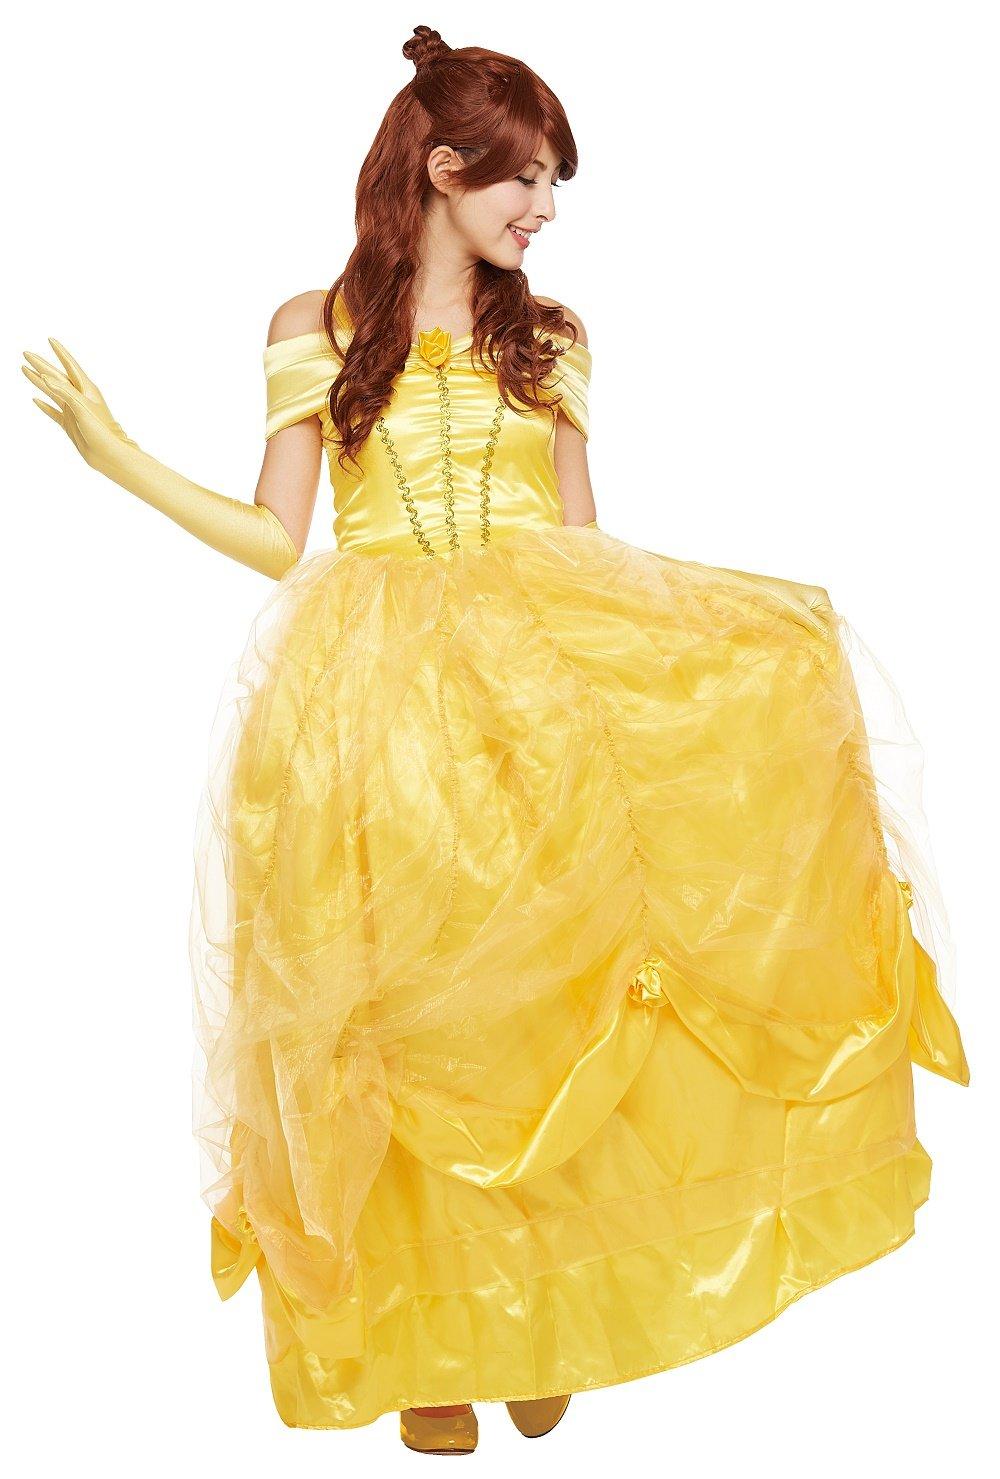 Disney's Beauty & the Beast Costume -- Belle Costume -- Teen / Women's STD Size